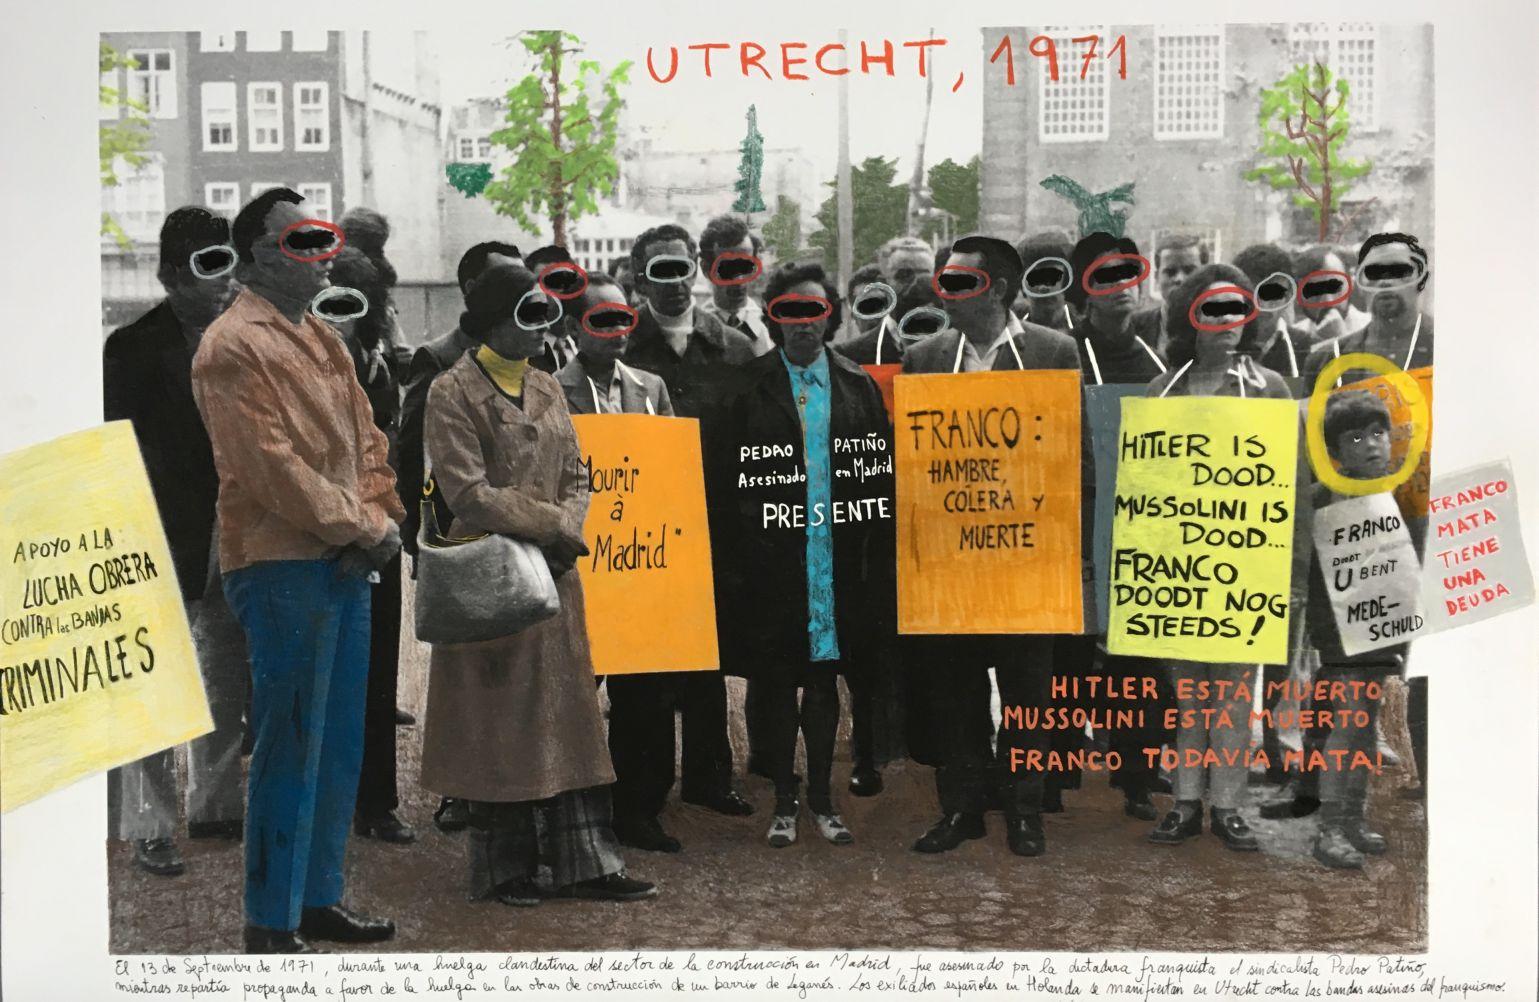 Utrecht, 1971 (2018) - Marcelo Brodsky